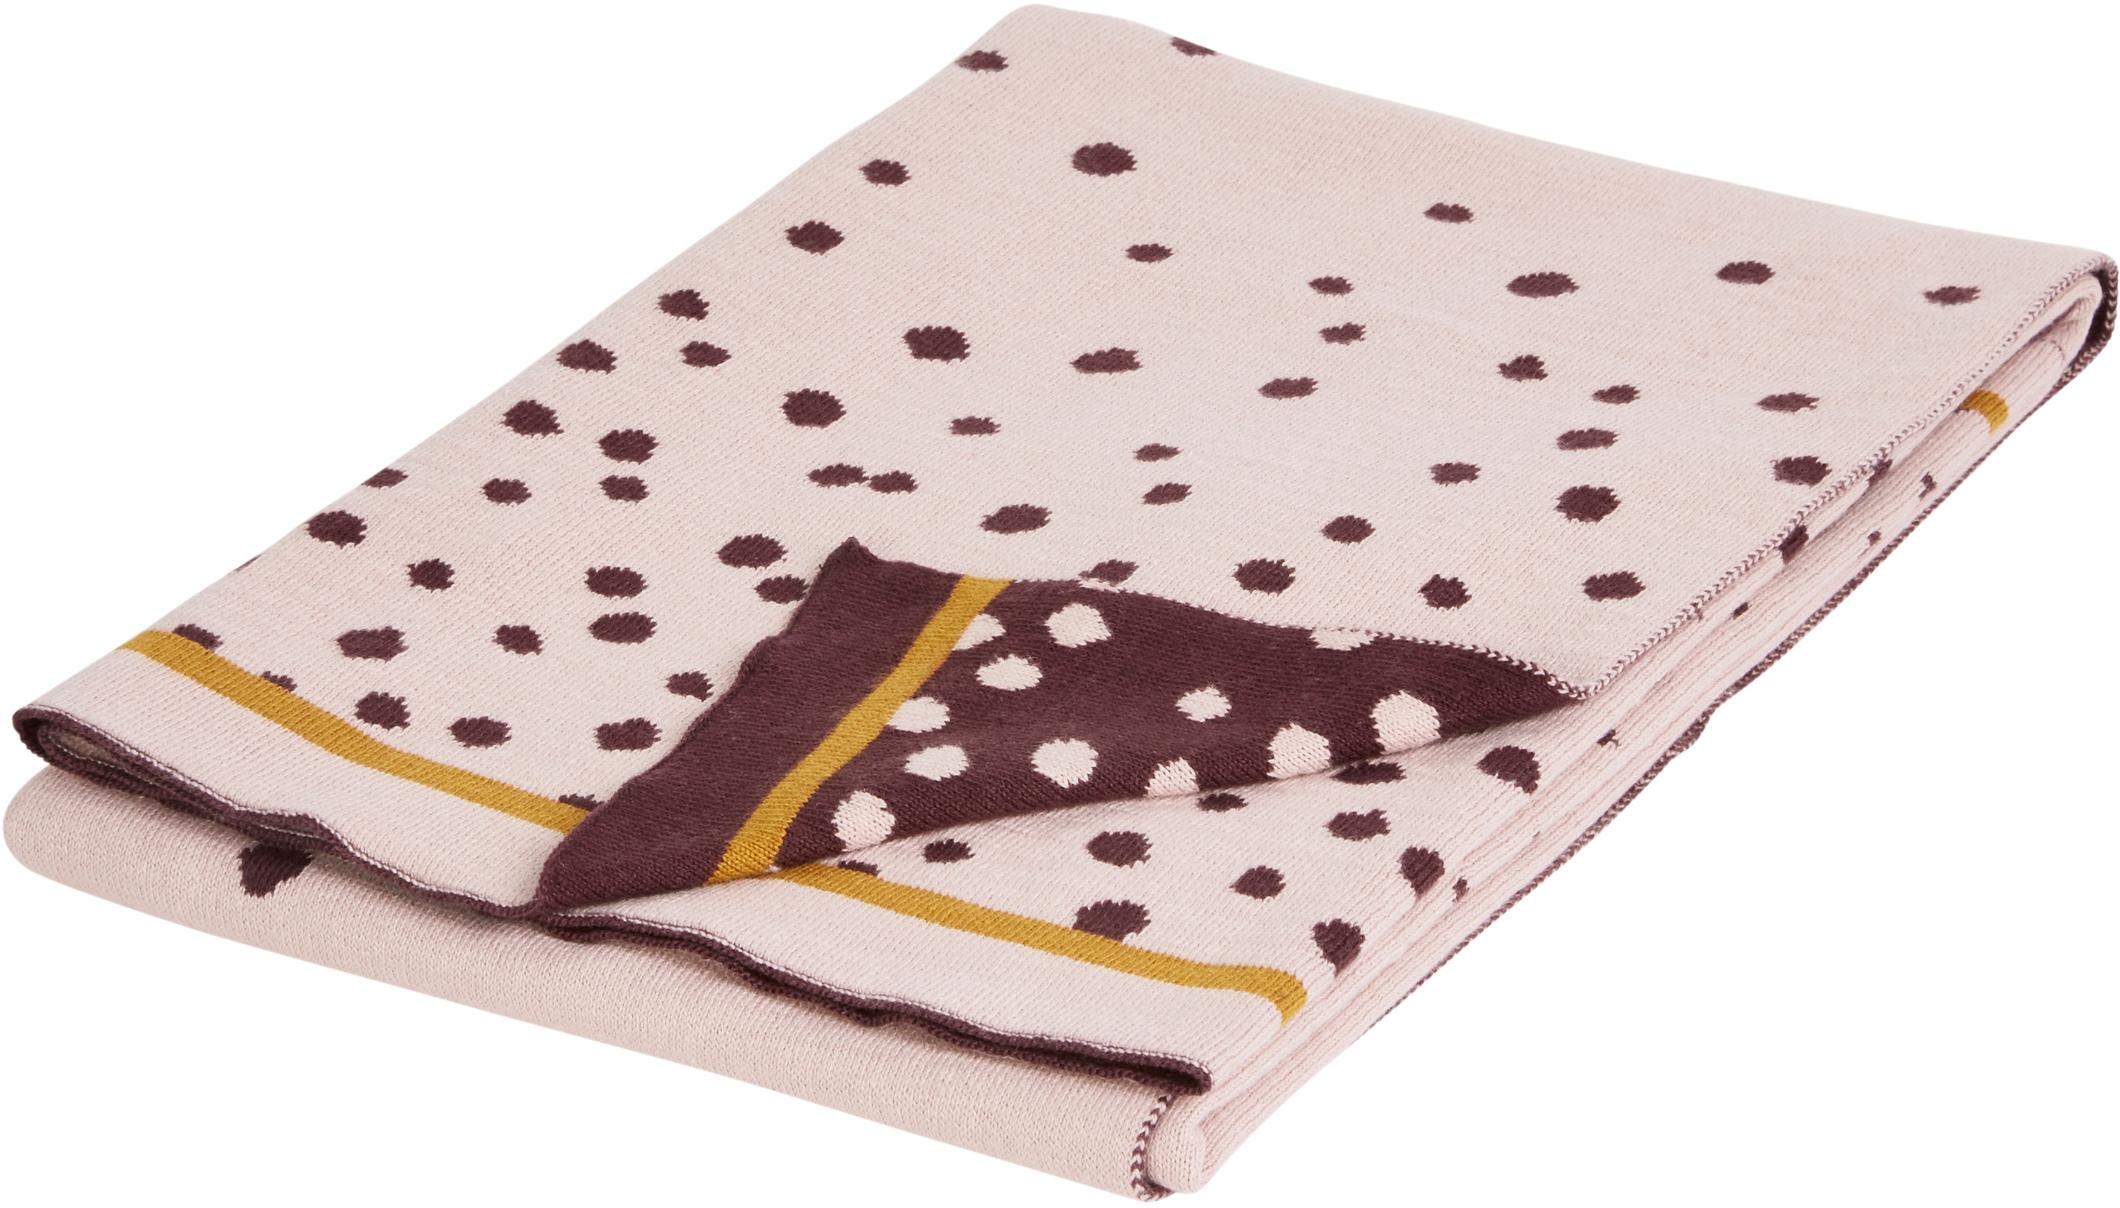 Coperta lavorata a maglia Happy Dots, Rosa, Larg. 80 x Lung. 100 cm